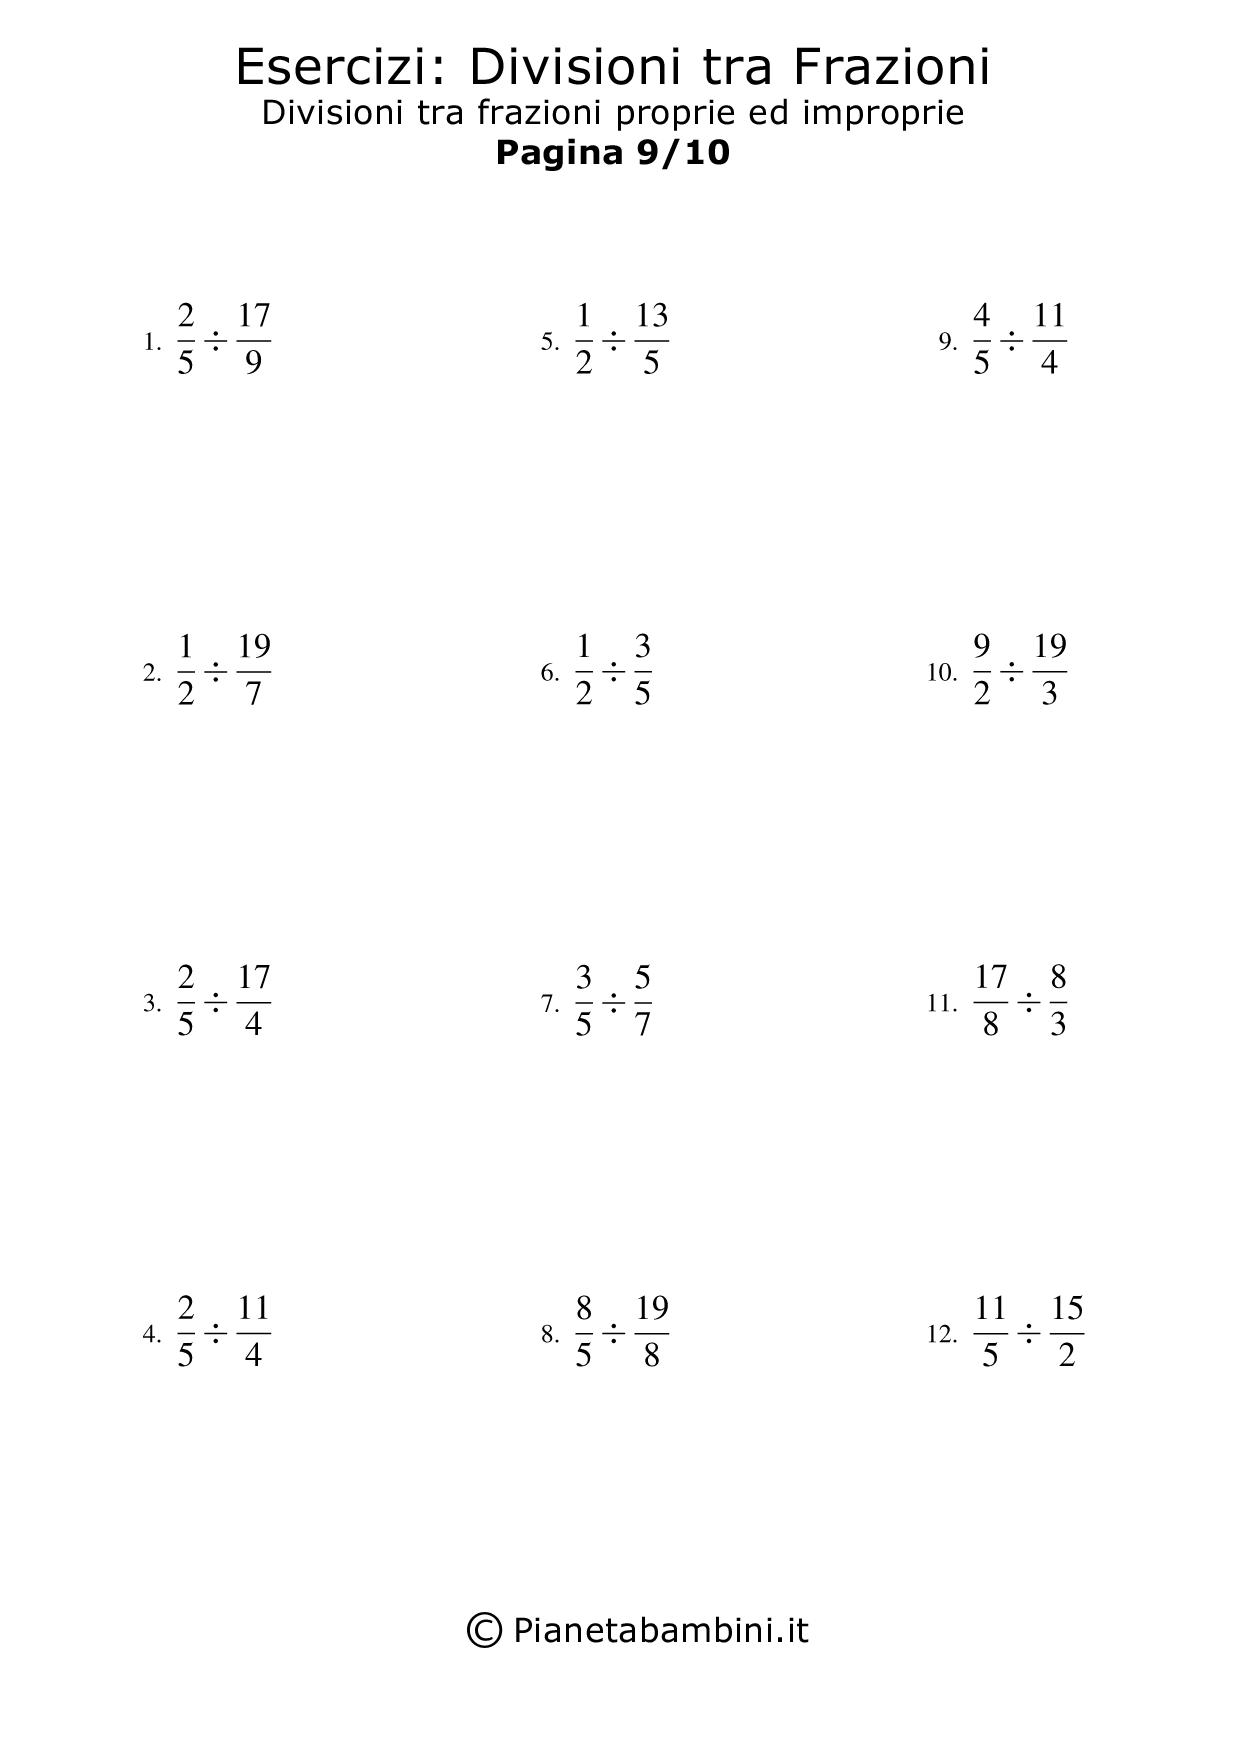 Esercizi-Divisioni-Frazioni-Proprie-Improprie_09